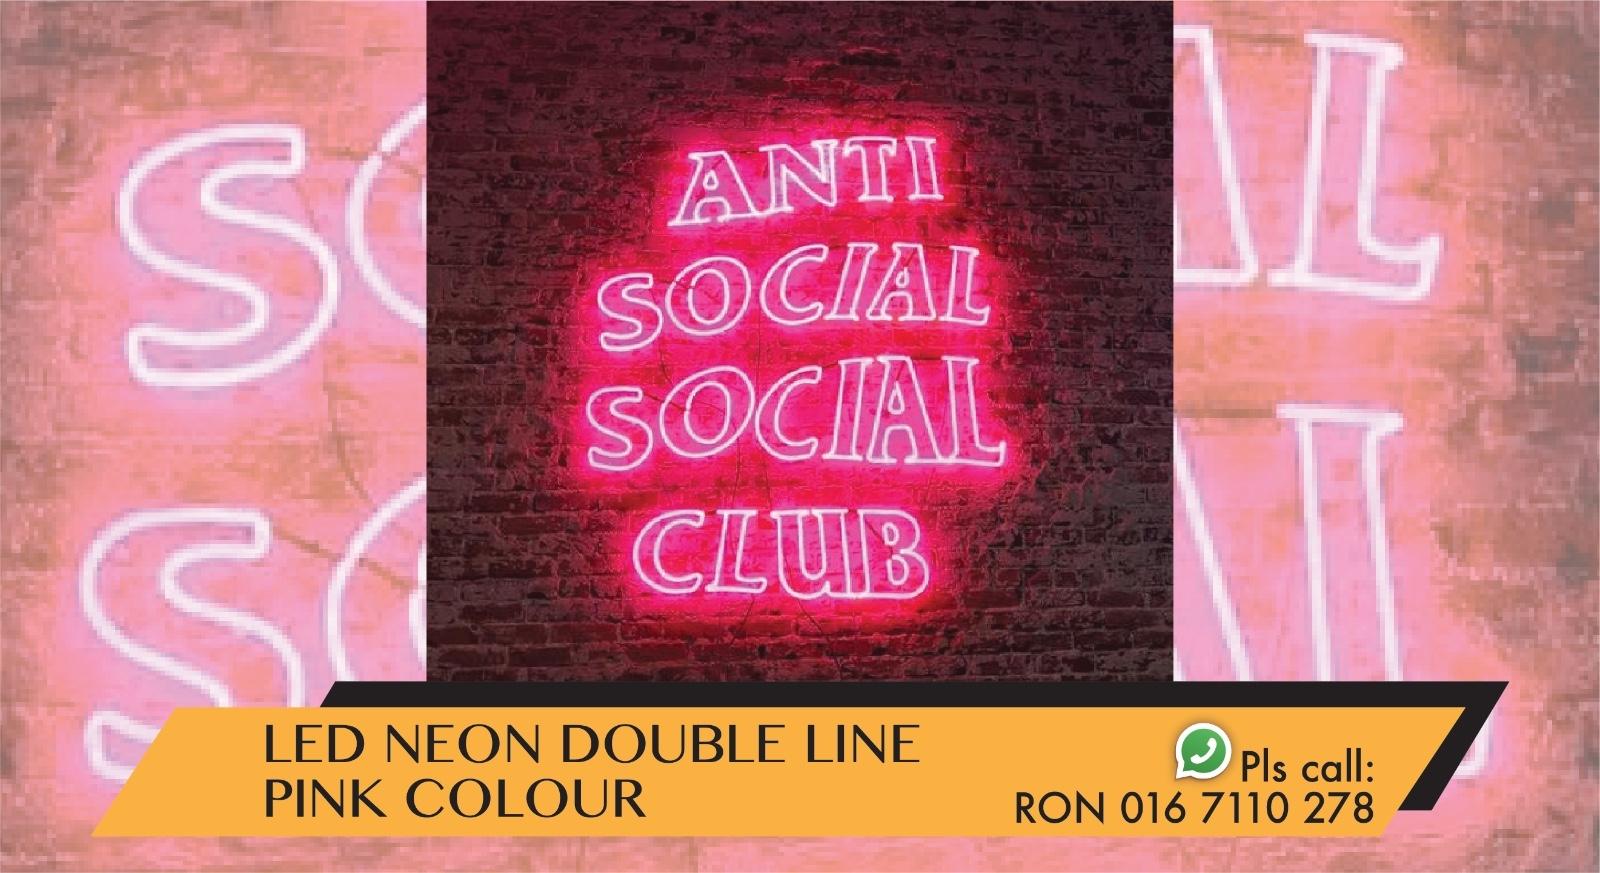 LED NEON (DOUBLE LINE) ANTI SOCIAL SOCIAL CLUB